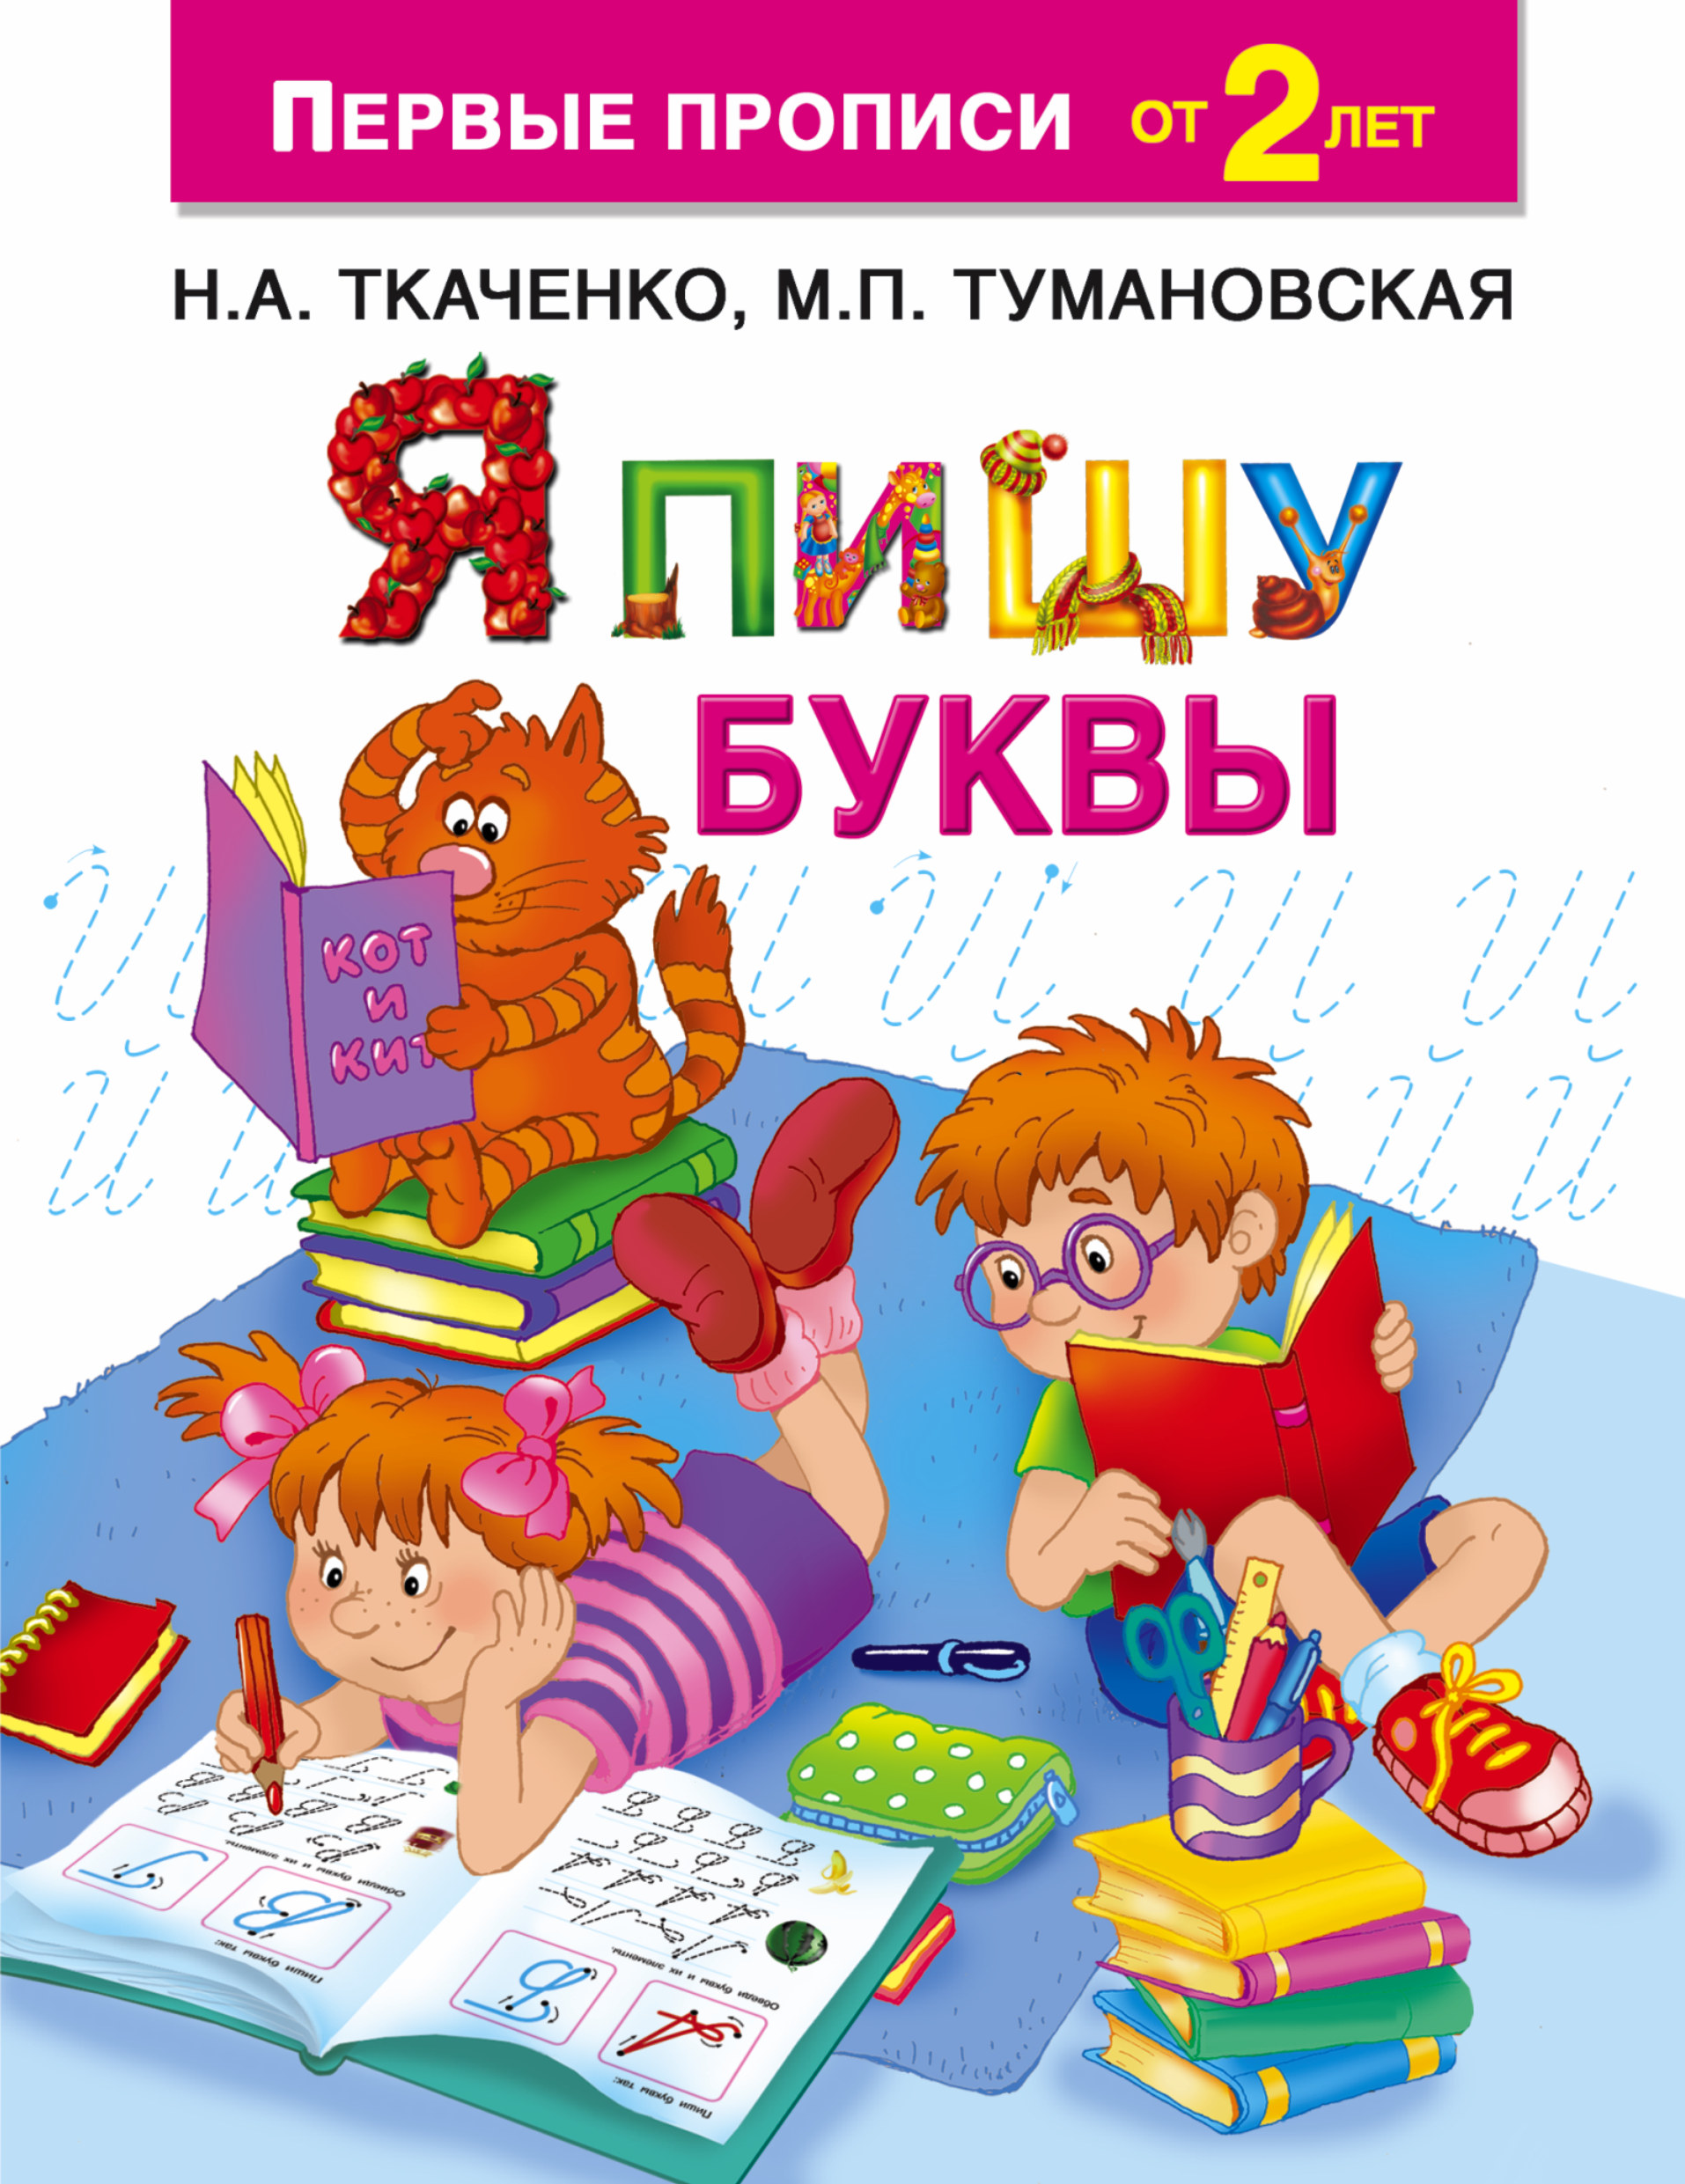 Ткаченко Н.А., Тумановская М.П. Я пишу буквы елена шамбалева я пишу красиво